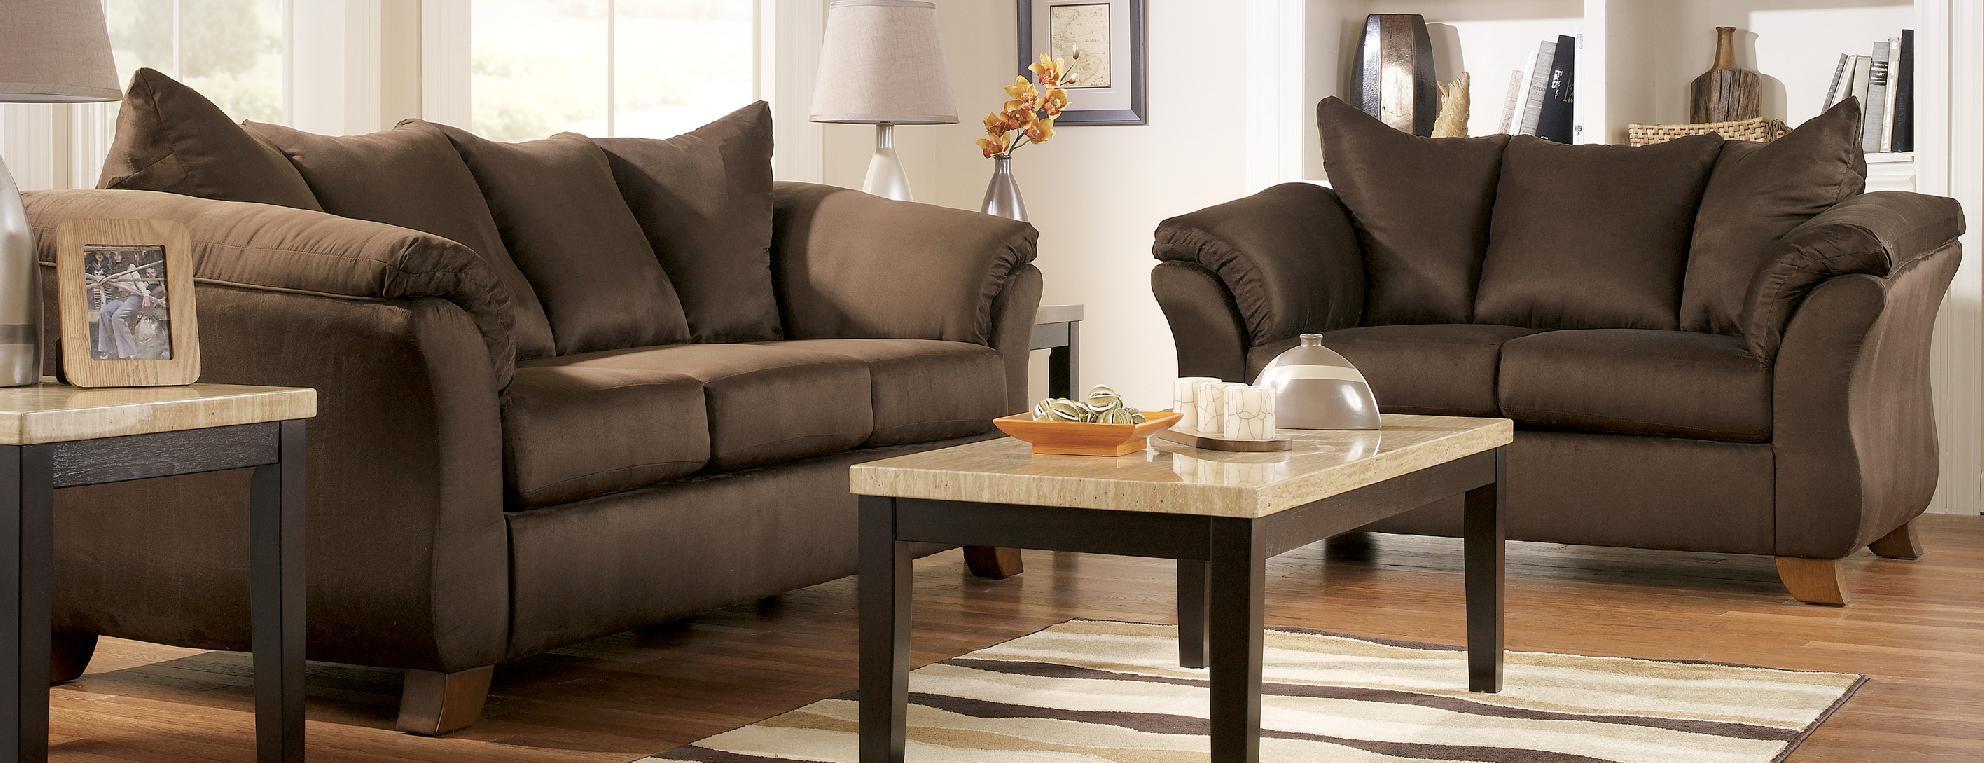 Exclusive Iving Room Furniture